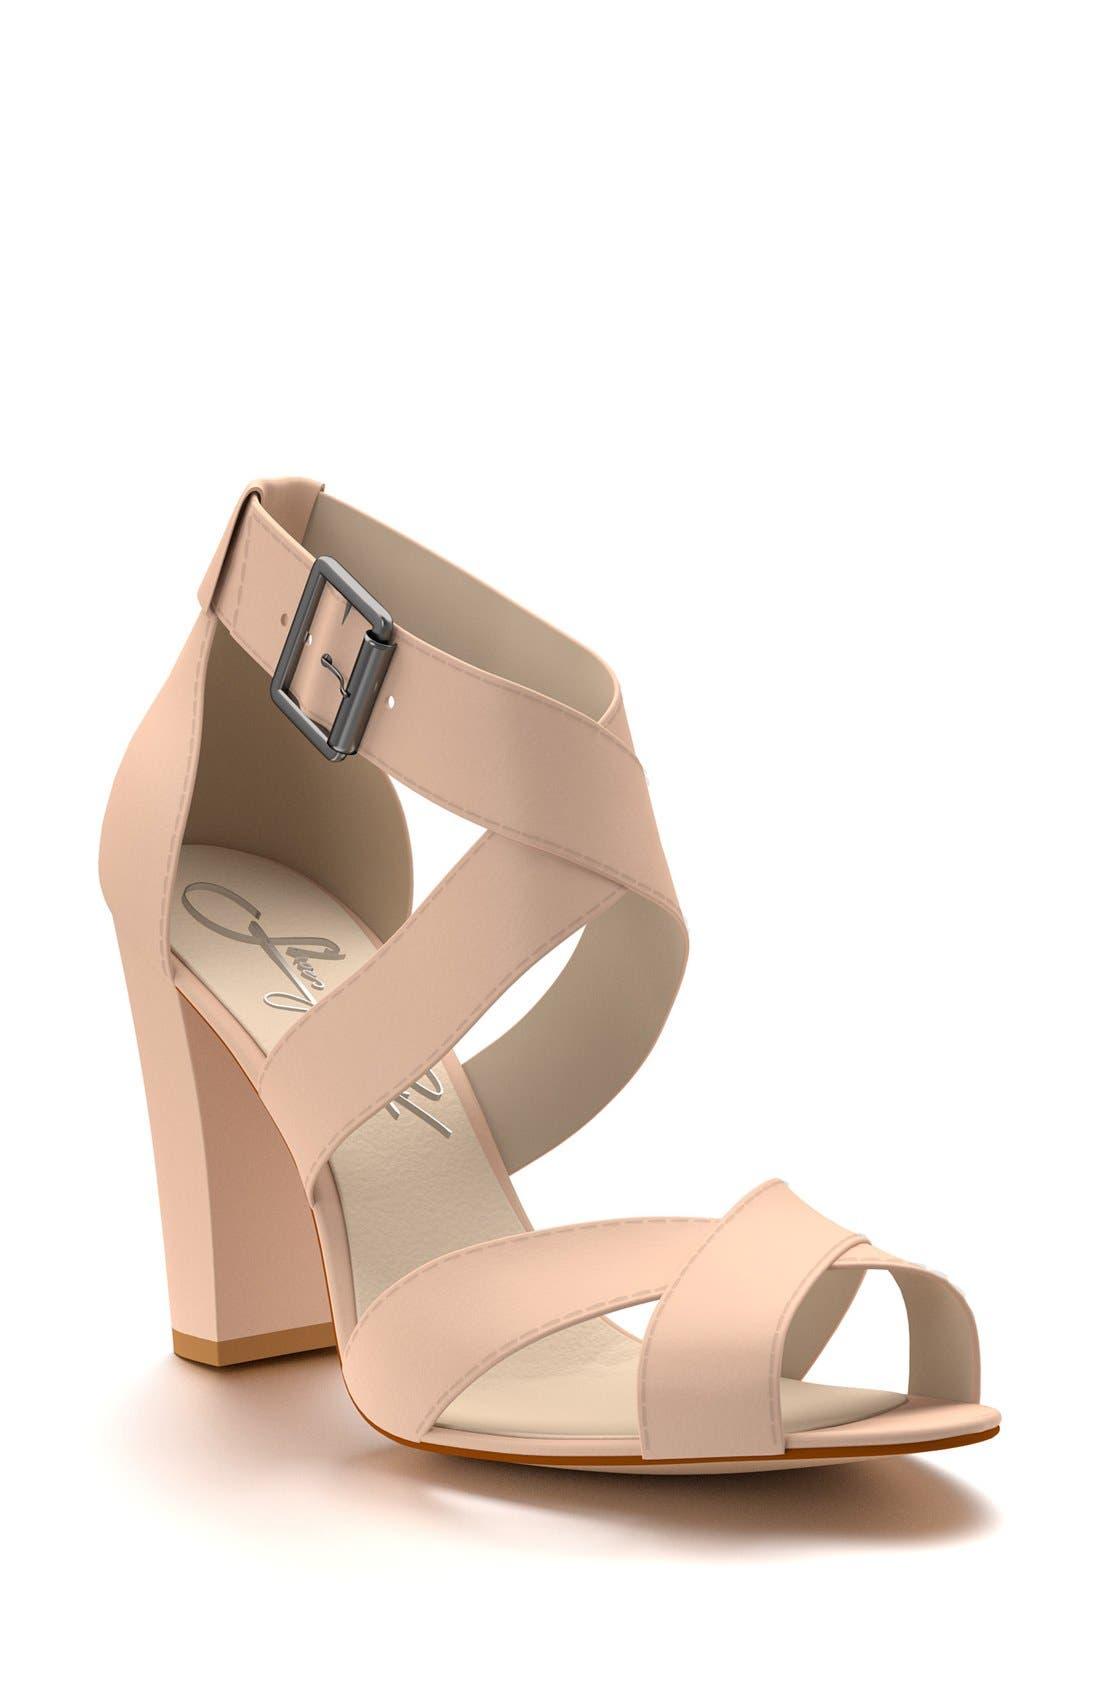 SHOES OF PREY Crisscross Strap Block Heel Sandal